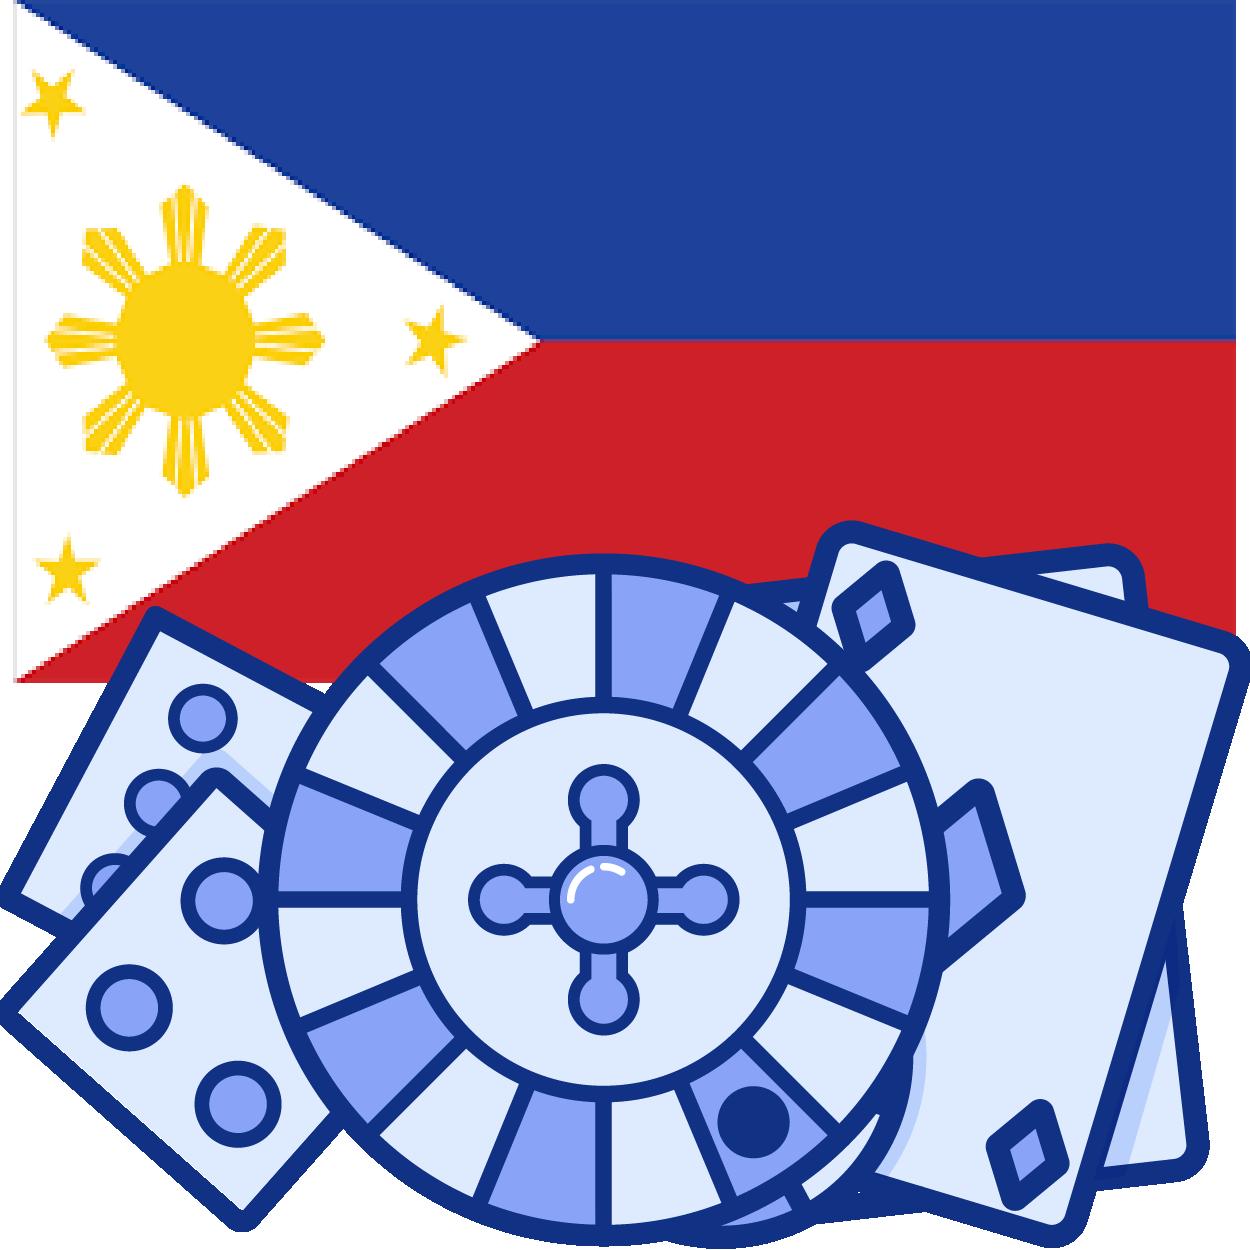 philippine flag icon